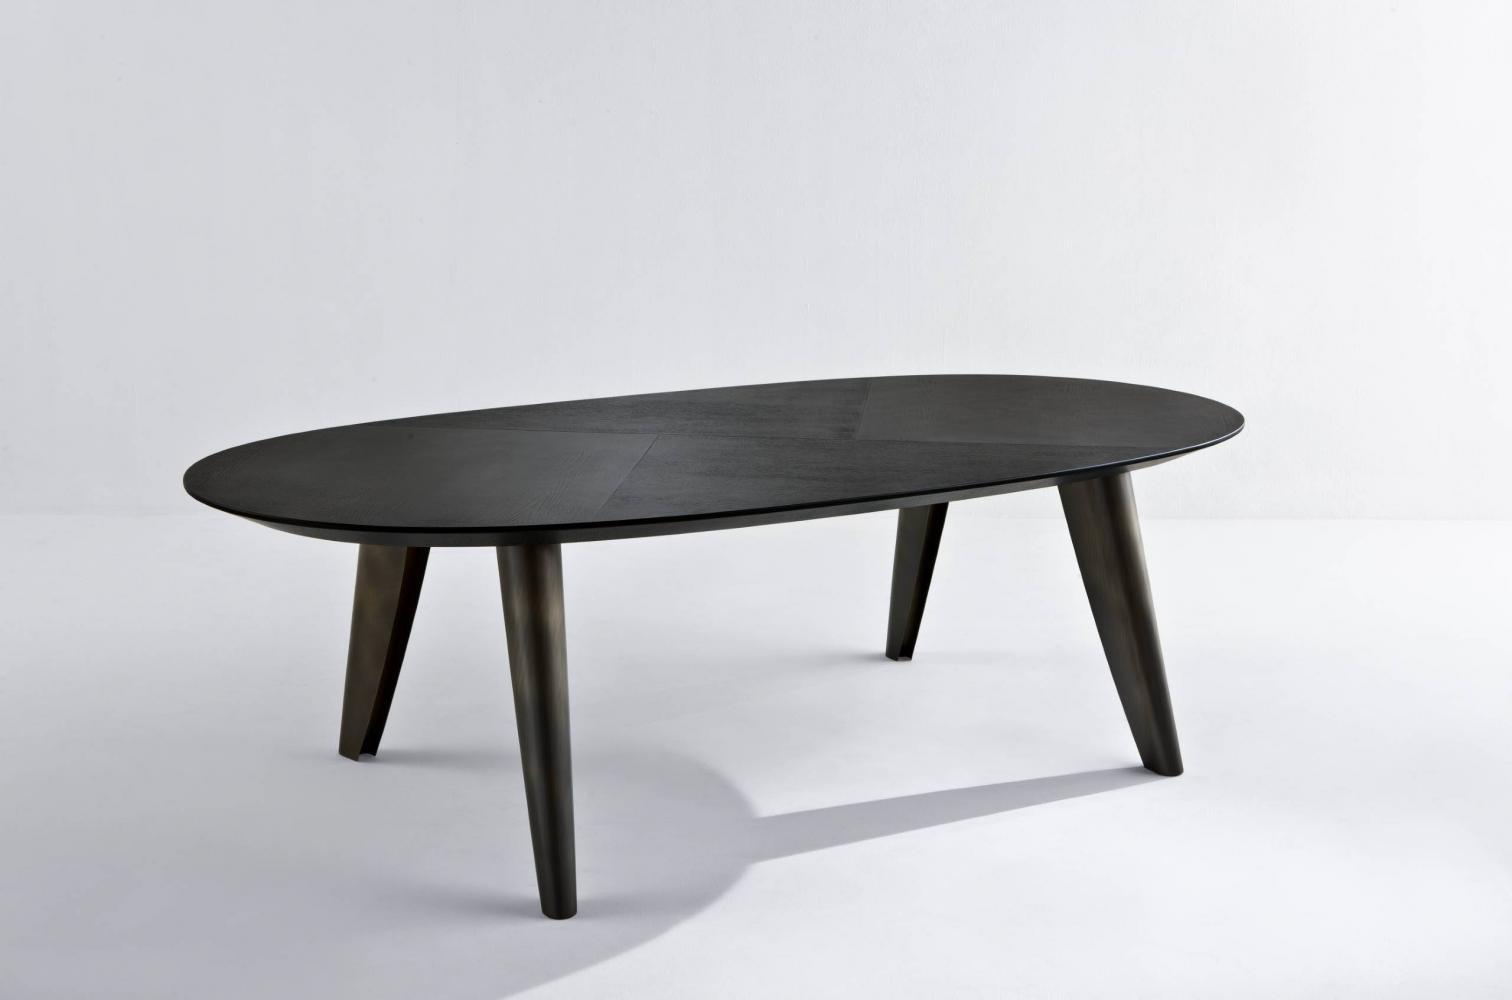 Black wood table for luxury materials interior design decor